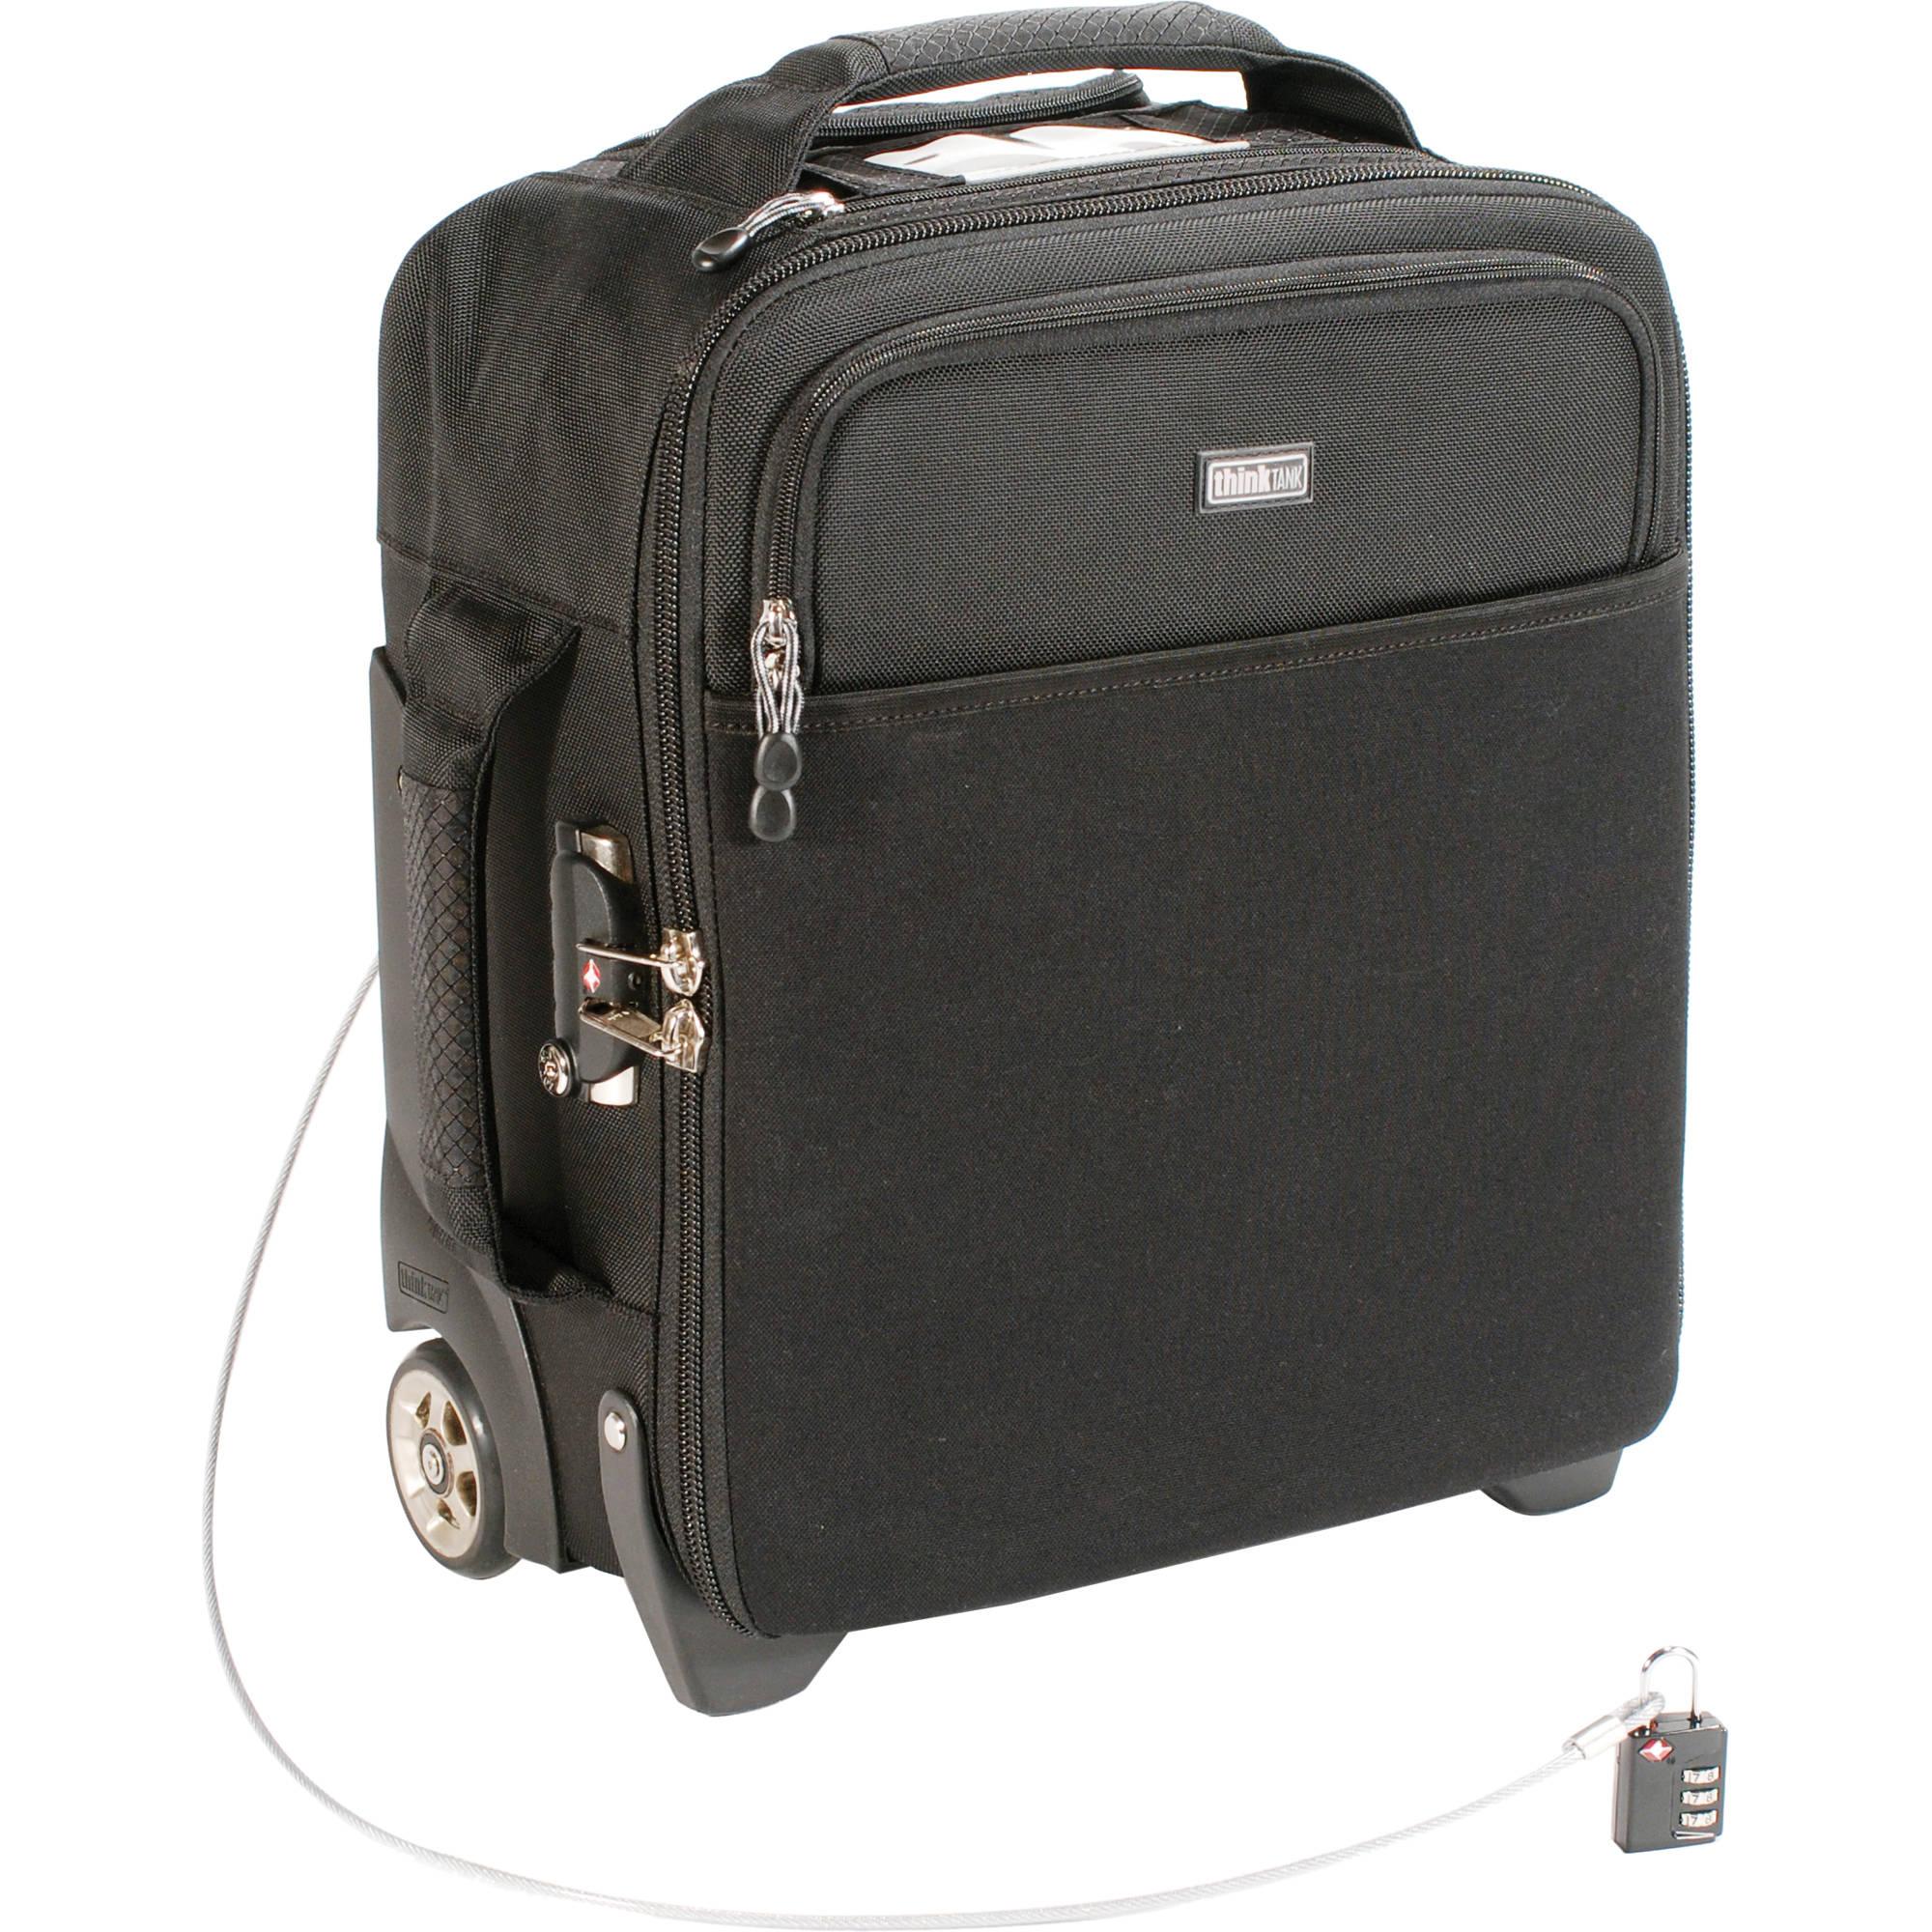 Think Tank Photo Airport Airstream Rolling Camera Bag Black